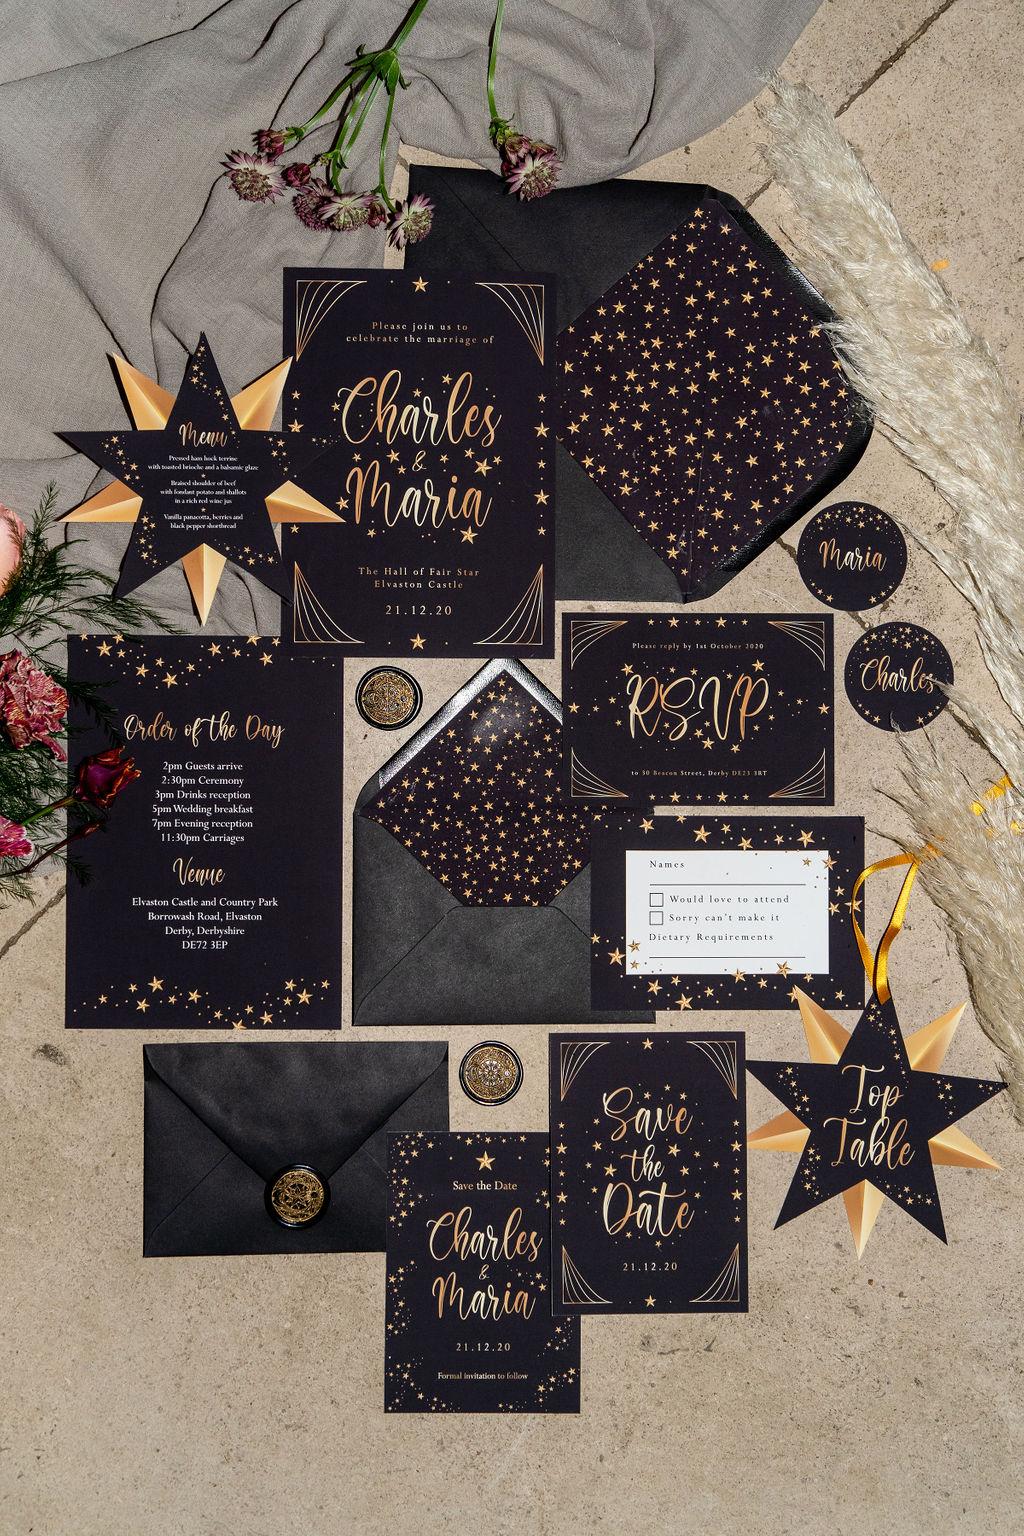 celestial gothic wedding - gothic wedding stationery - celestial gothic wedding stationery - unique wedding stationery - alternative wedding stationery - unconventional wedding